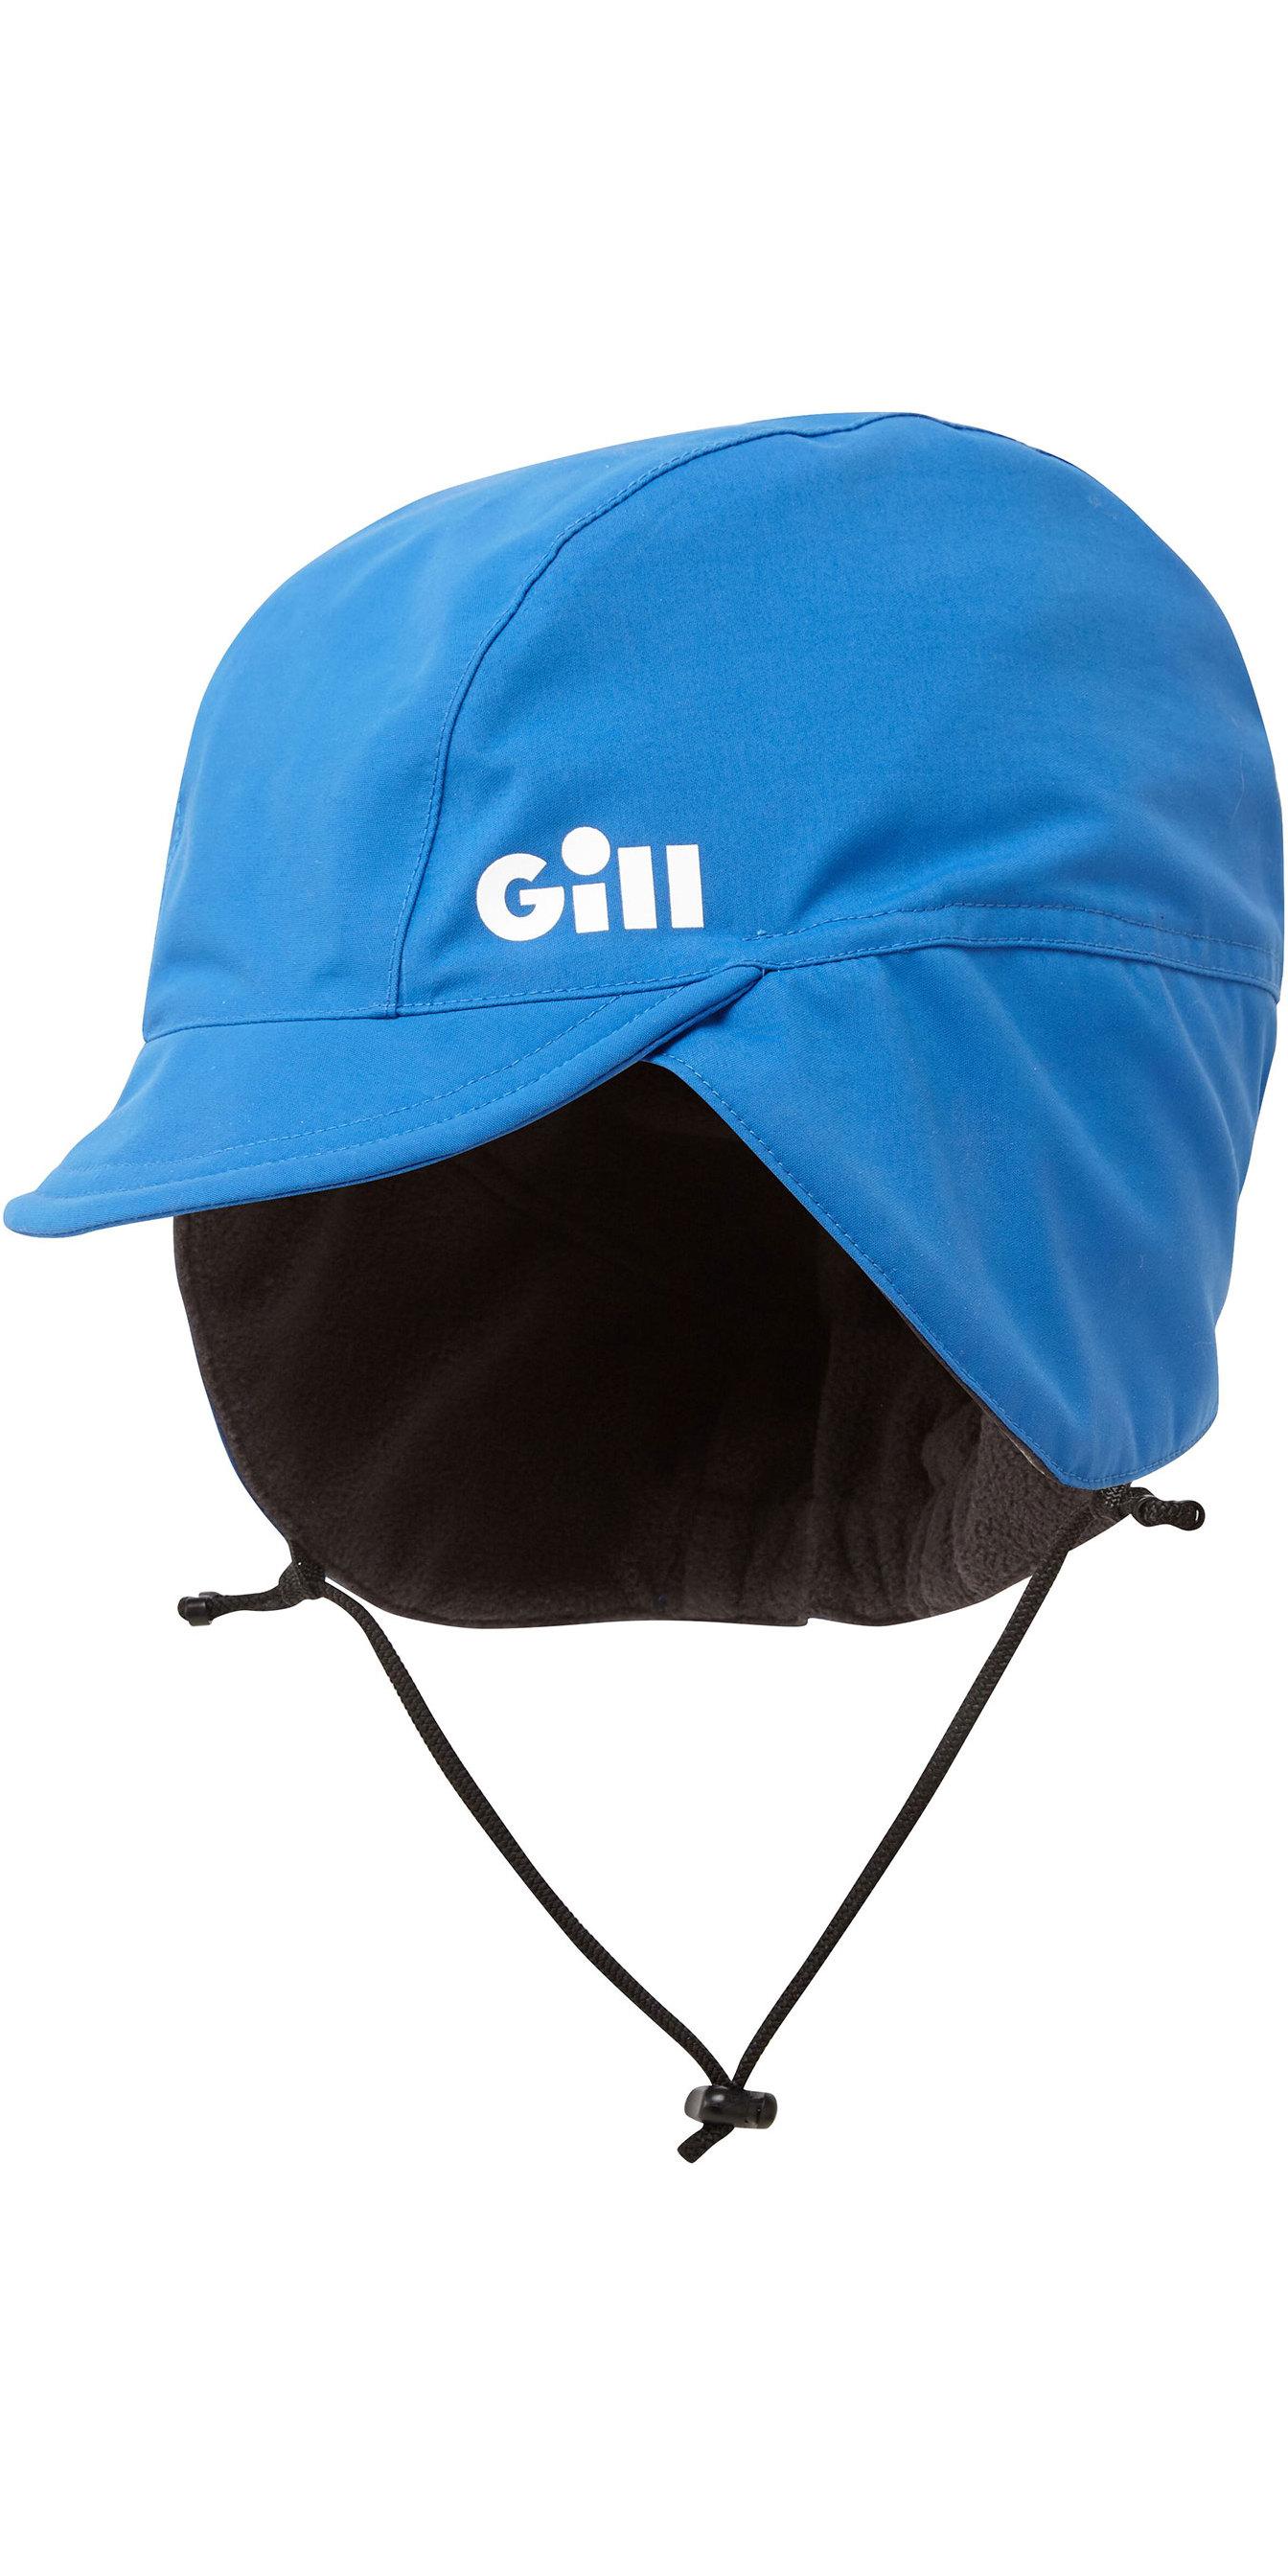 2019 Gill OS Waterproof Hat Blue HT44